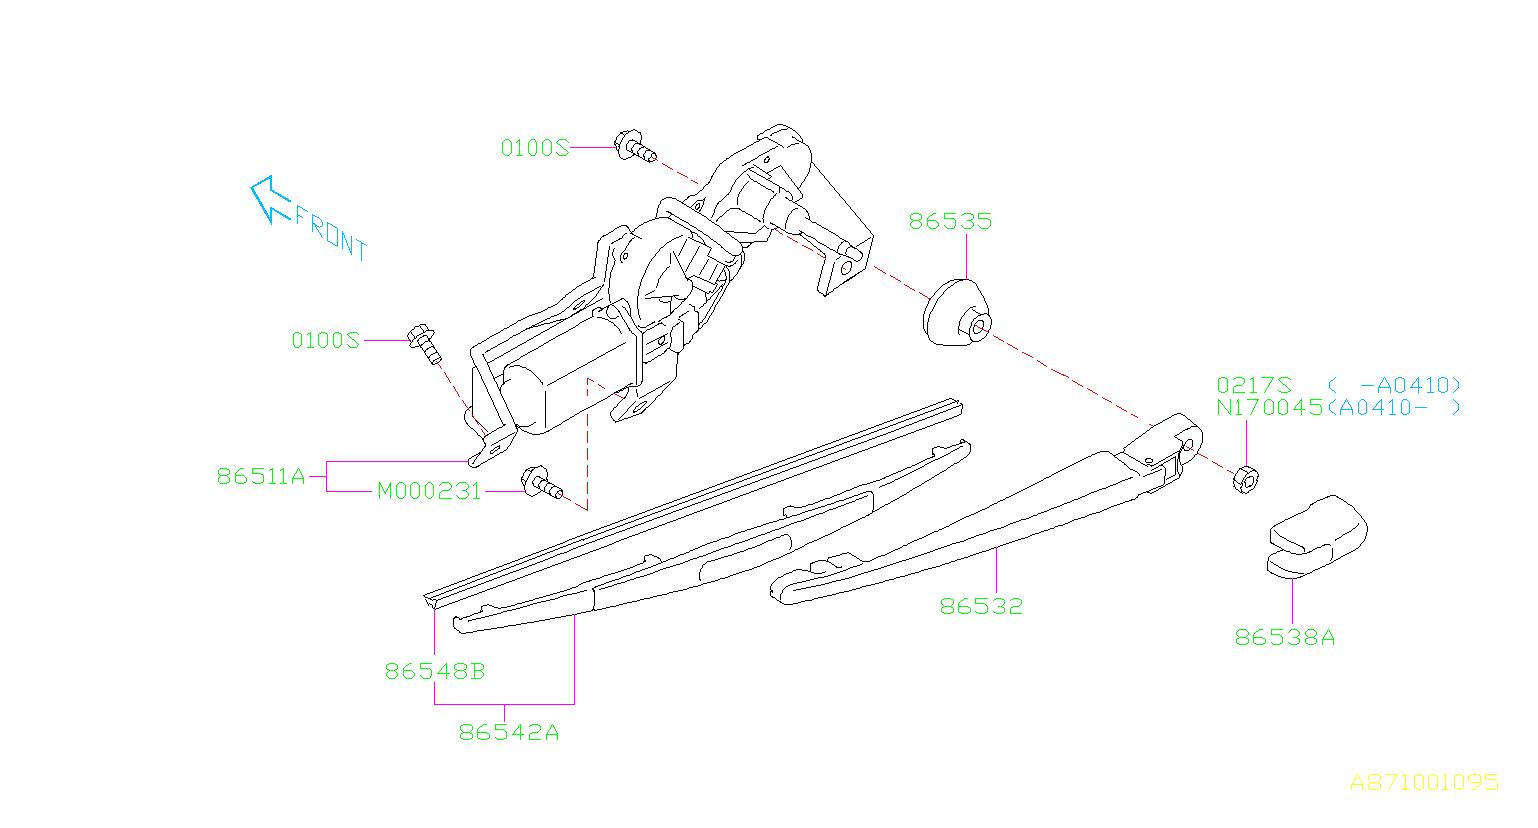 tags: #bmw n52 dme wiring diagrams#bmw wiring color codes#bmw e53 wiring  diagrams#bmw schematic diagram#bmw 2002 wiring diagram pdf#bmw wiring  harness